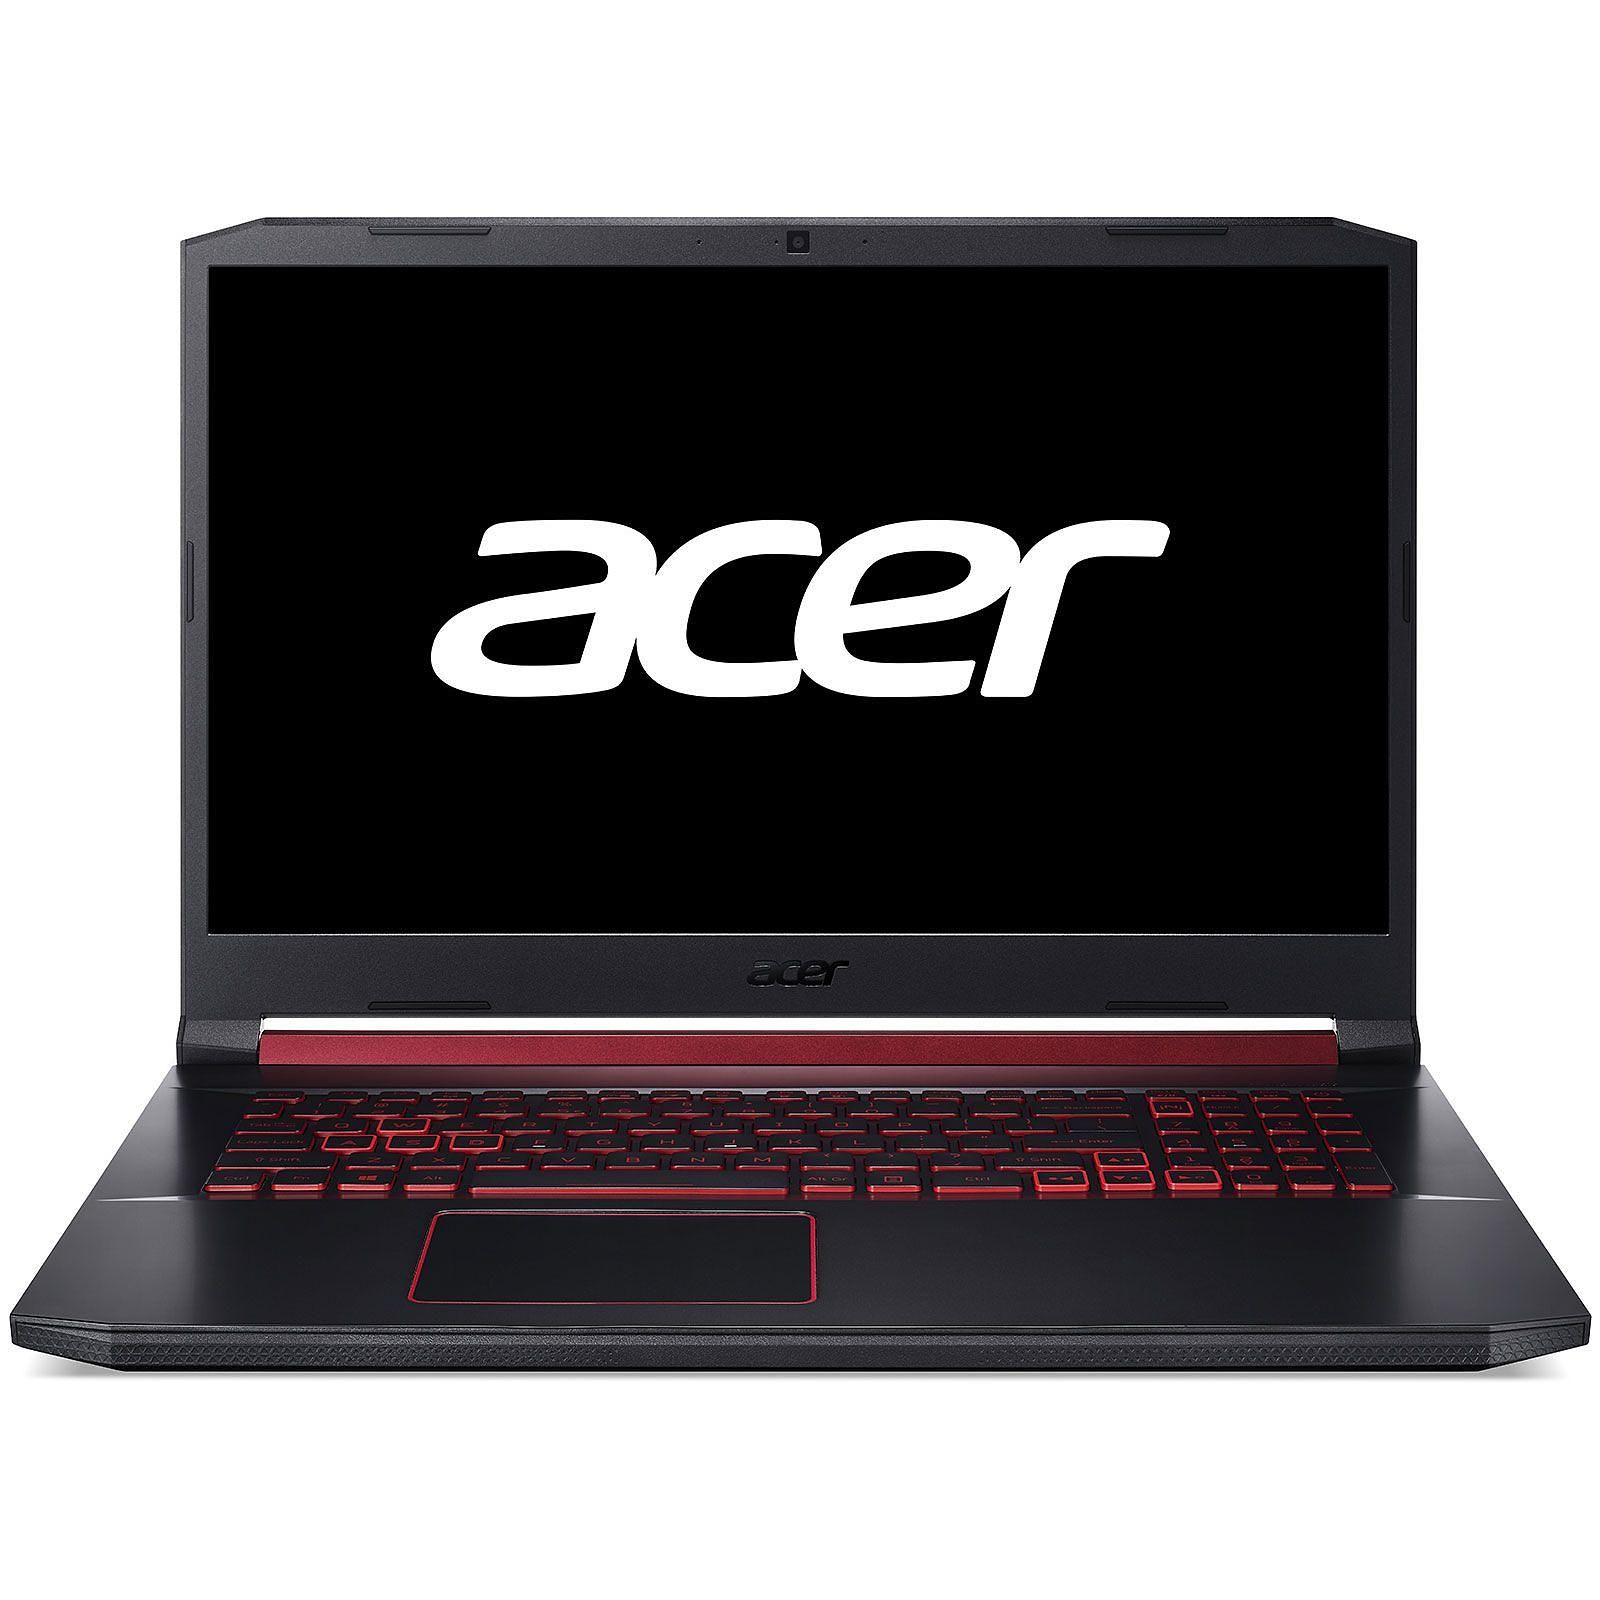 Acer NH.Q9BEF.009 - PC portable Acer - Cybertek.fr - 3